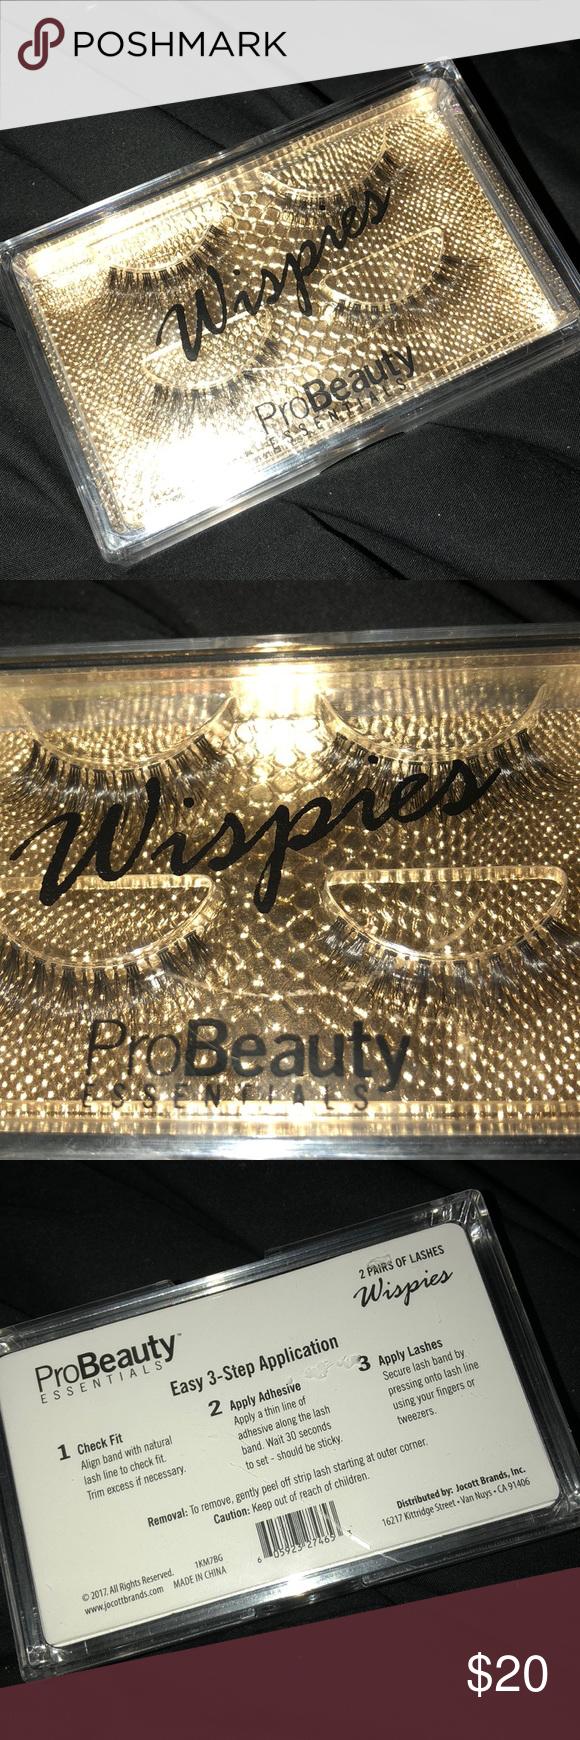 02c372802de Pro Beauty Essentials Wispies💫 New Beautiful Ulta Beauty Makeup False  Eyelashes